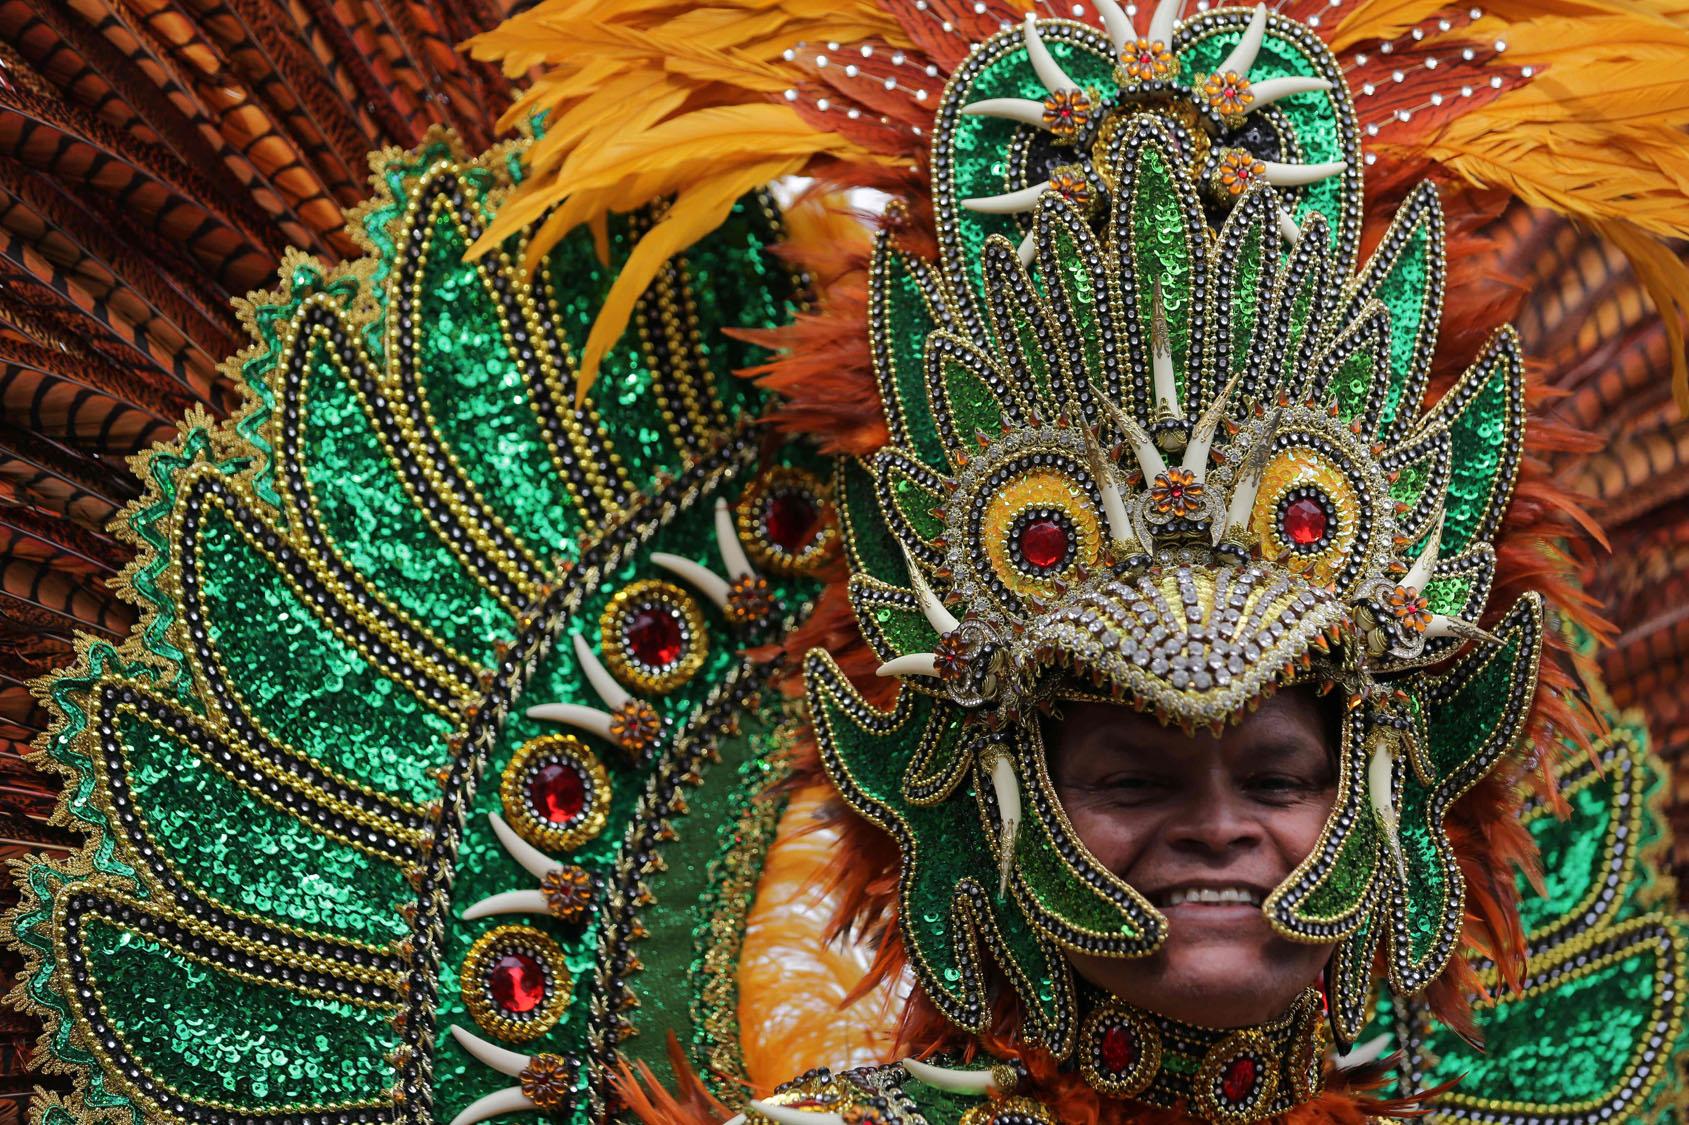 Caribbean Culture: Celebrating Caribbean Culture At London's Notting Hill